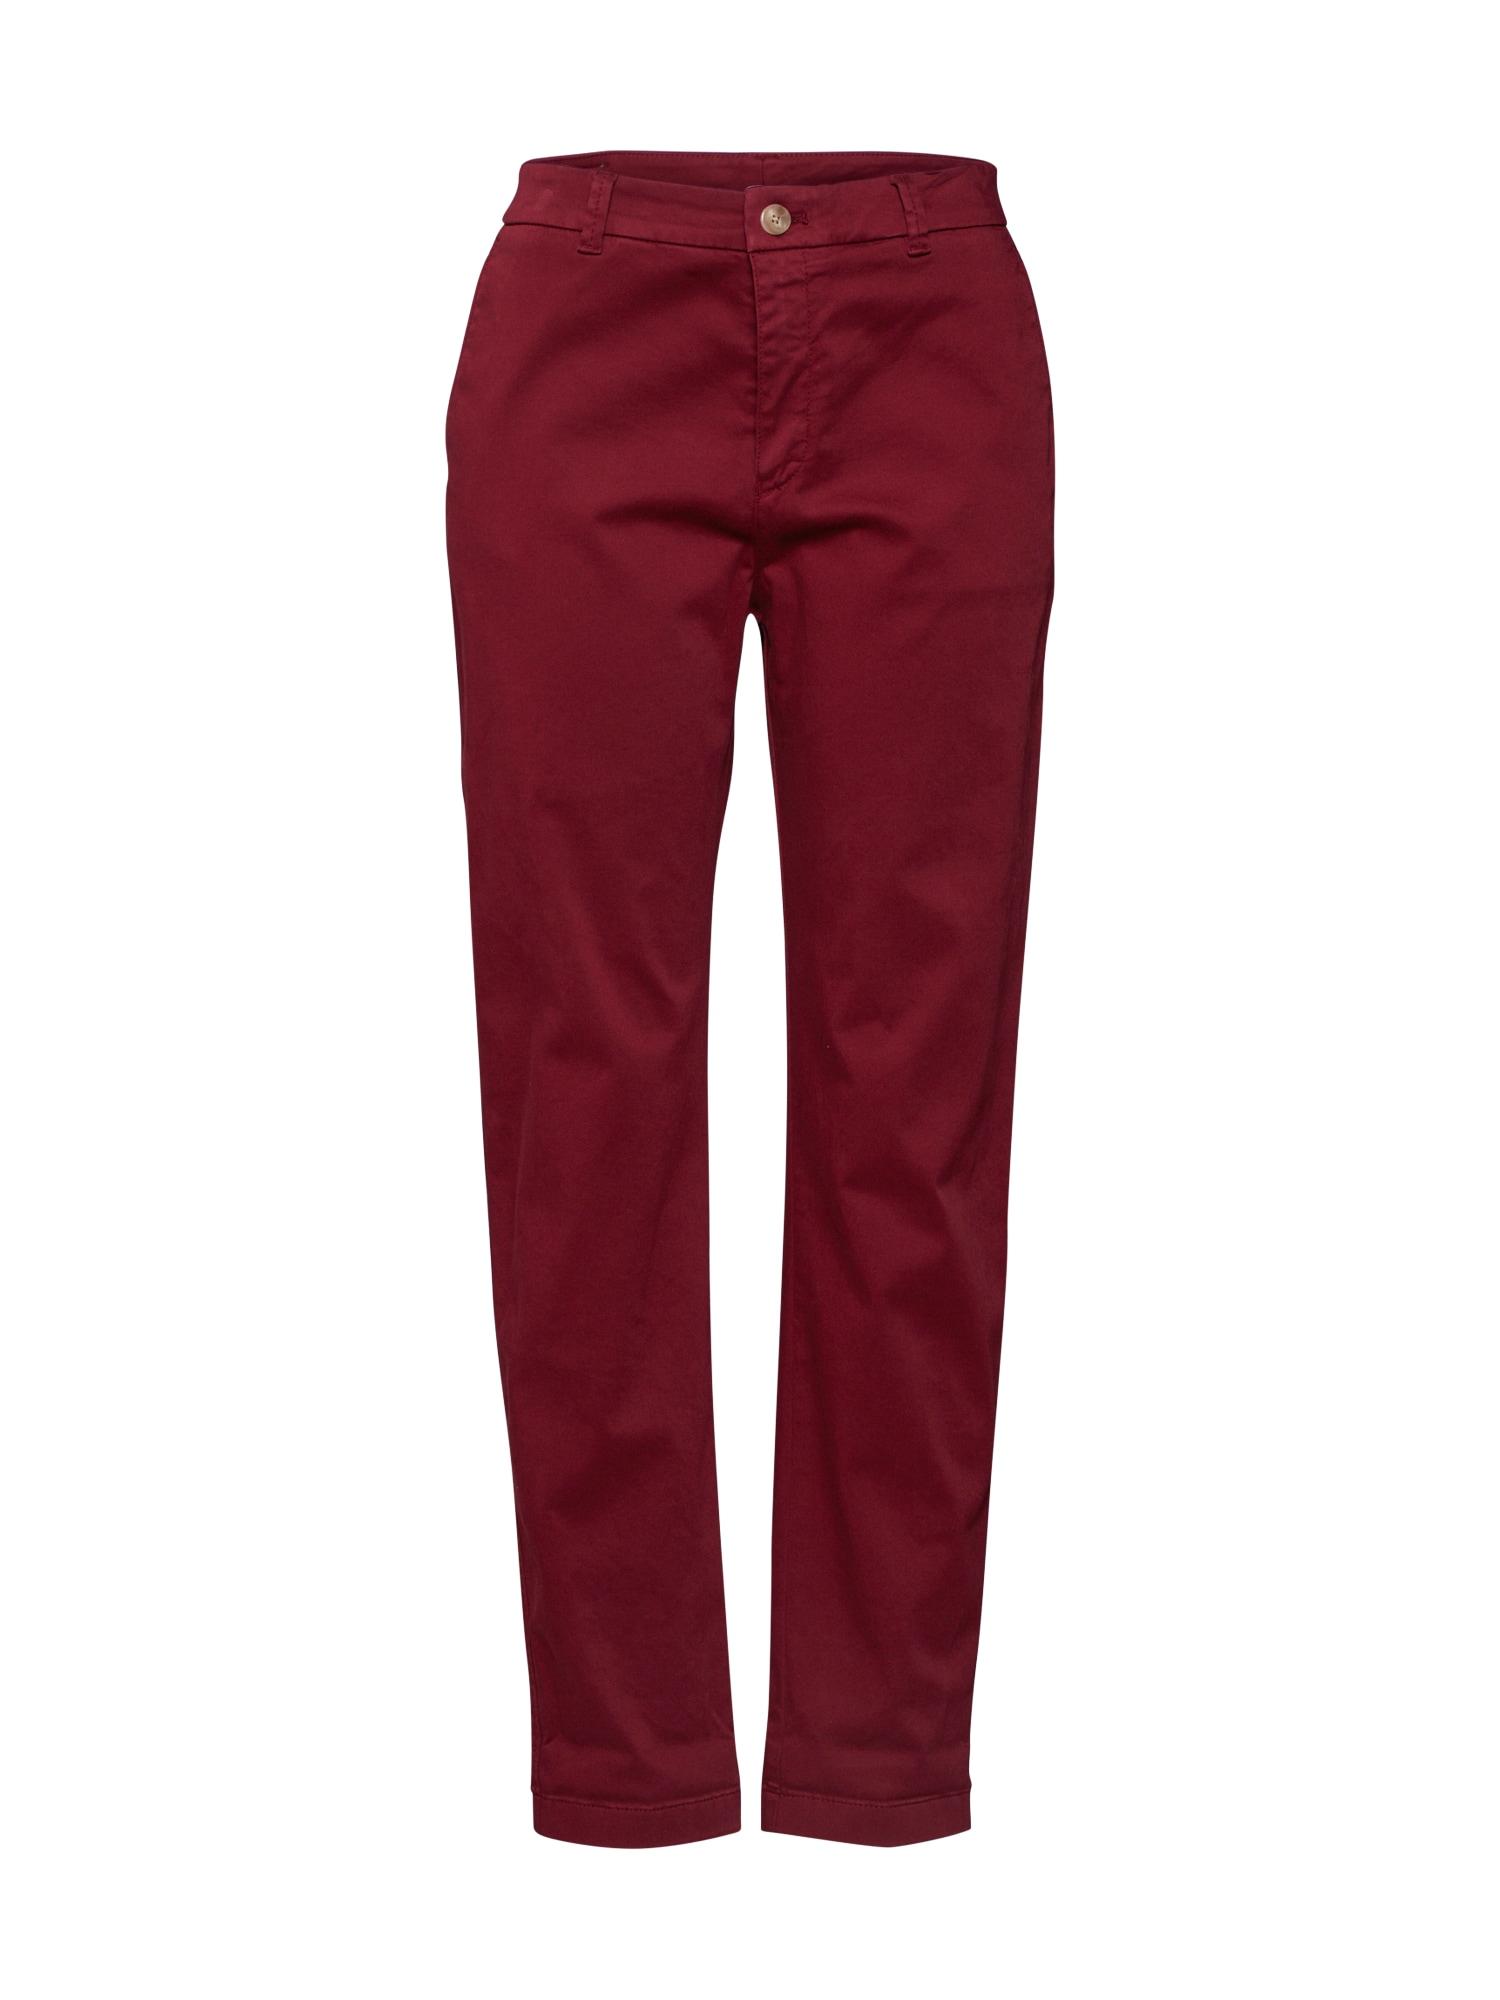 BOSS Chino stiliaus kelnės 'Sachini3-D' raudona